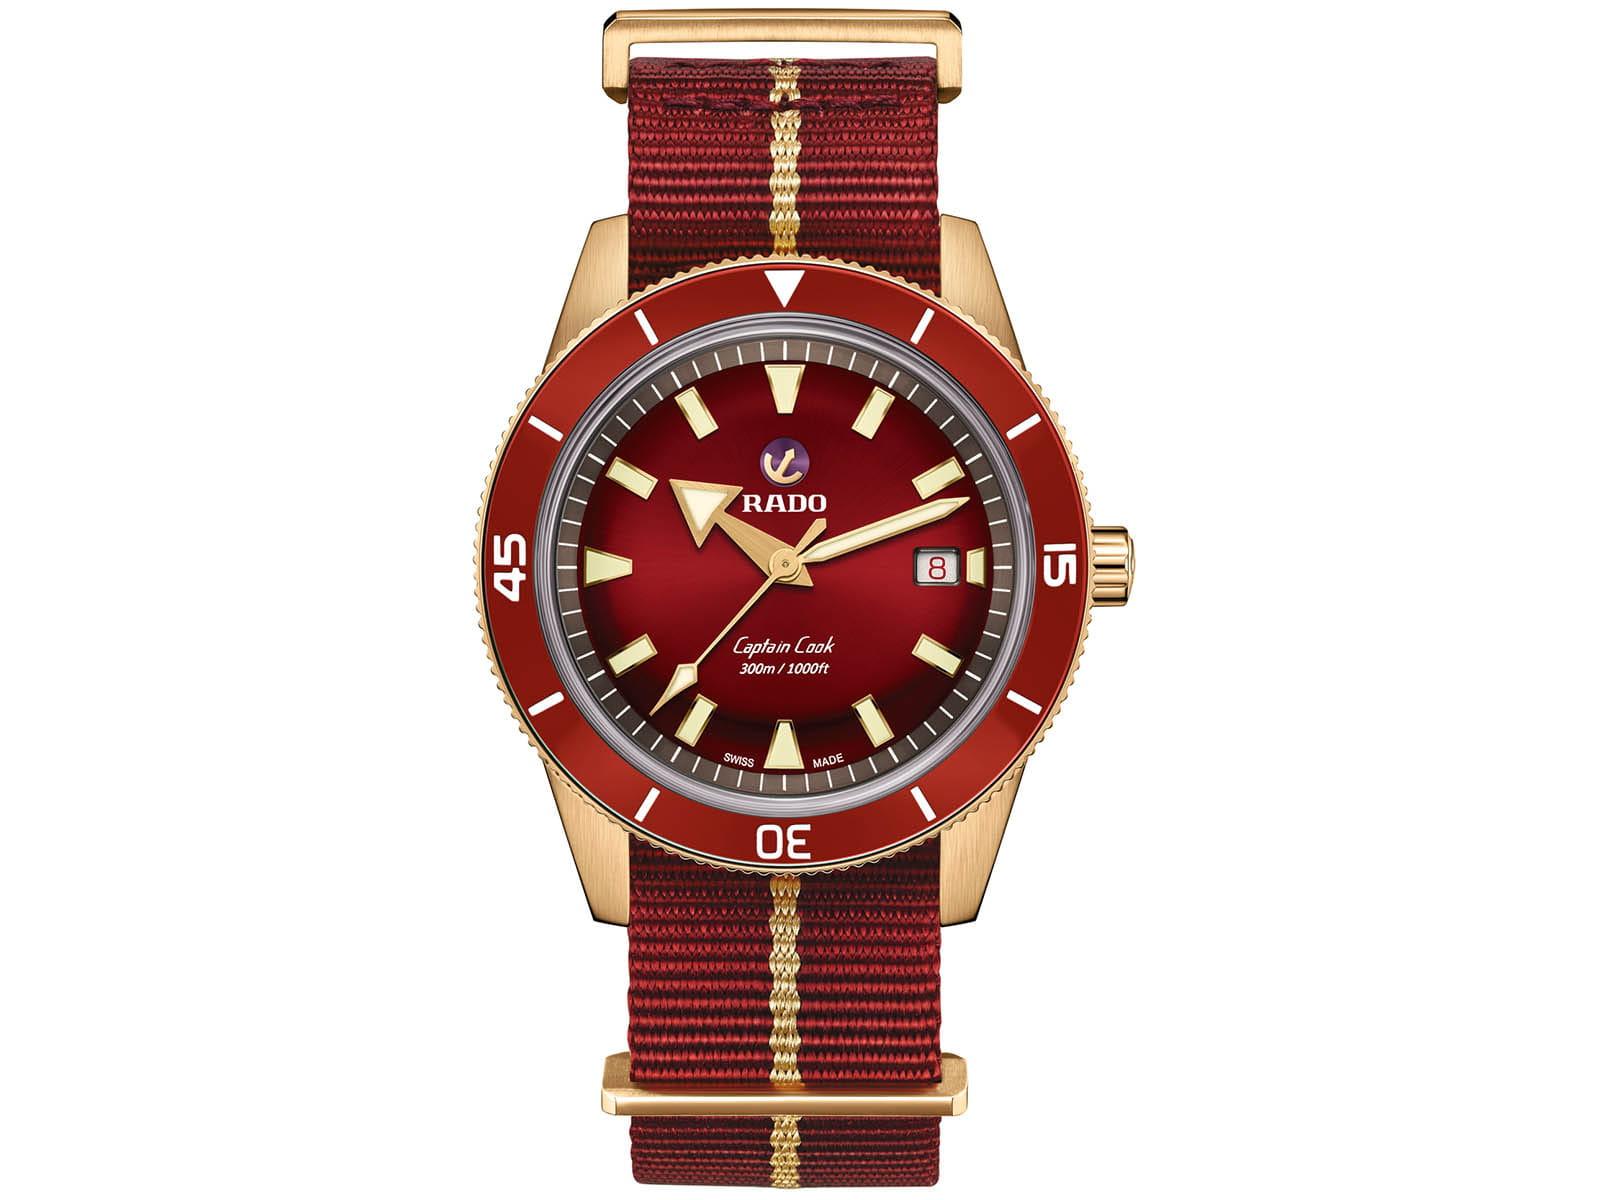 01-763-0504-3-540-rado-captain-cook-bronze-burgundy-dial-4.jpg